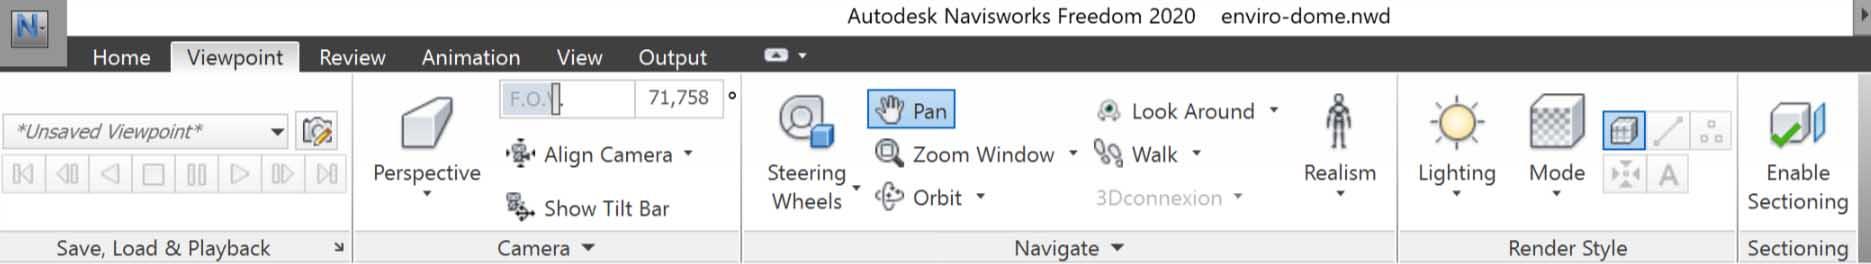 Autodesk Navisworks Freedom Menu